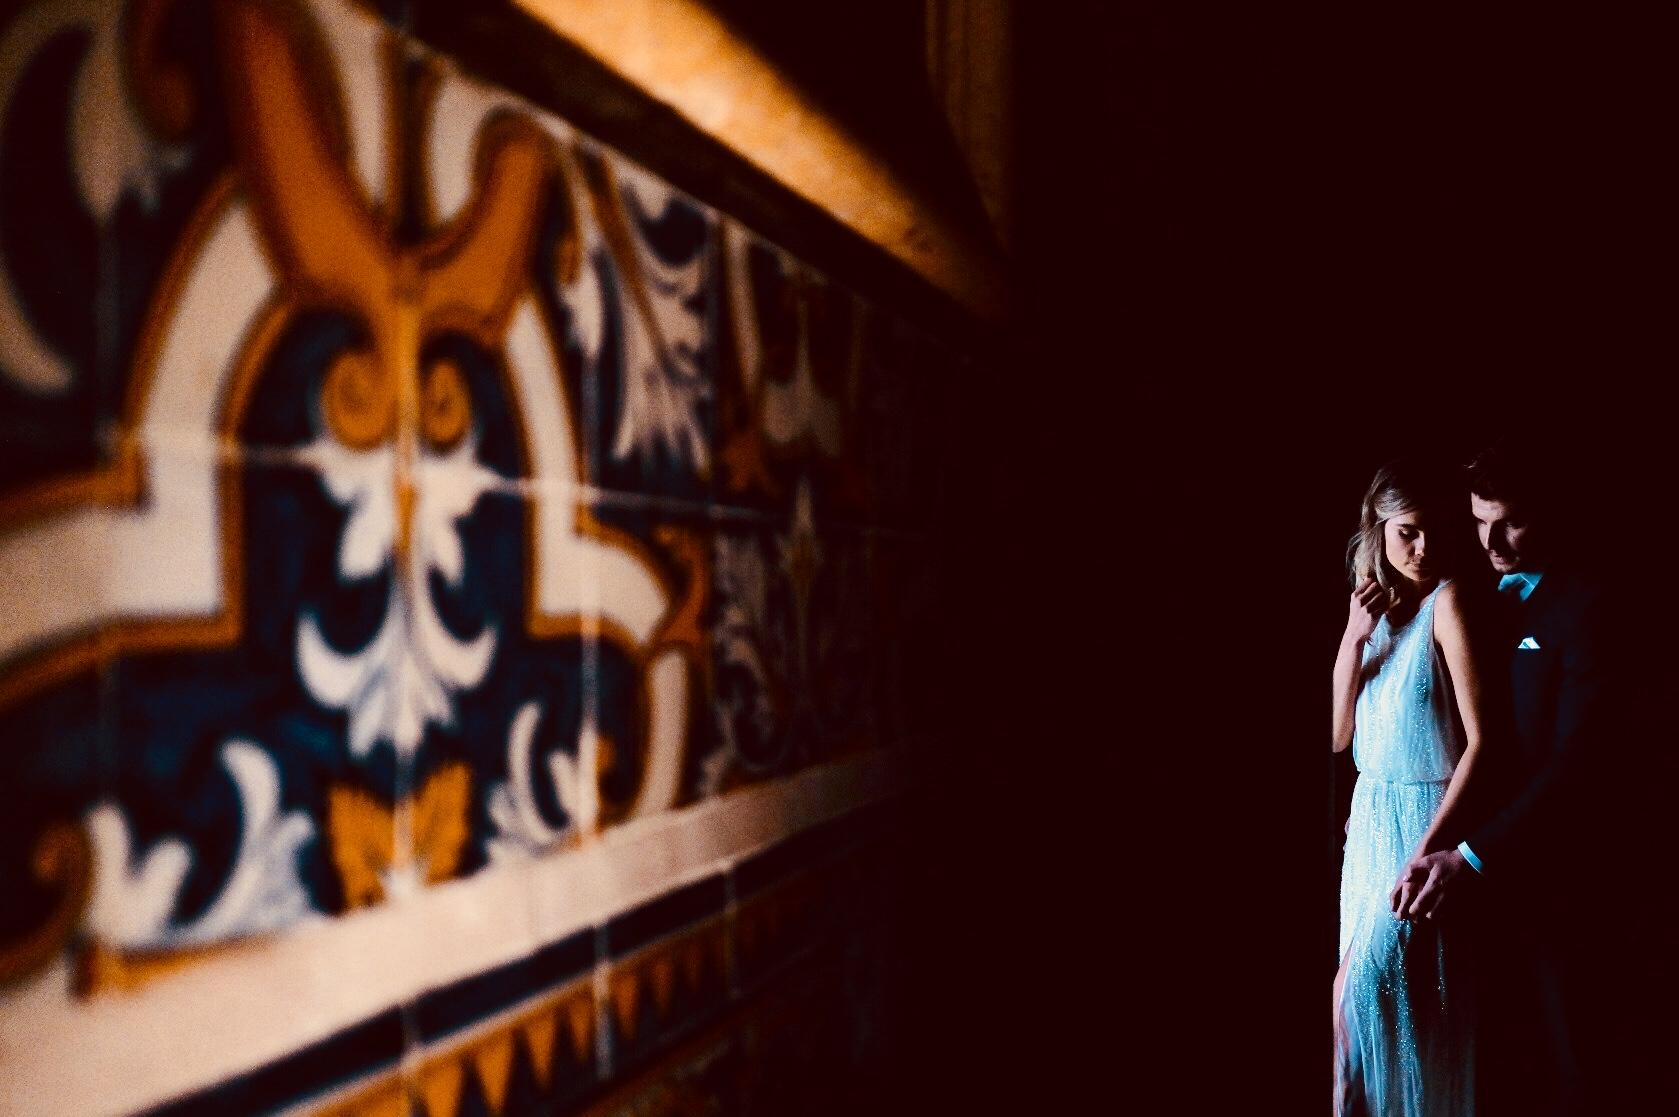 Riccardo Spatolisano: Lisbona con Fujifilm X-H1